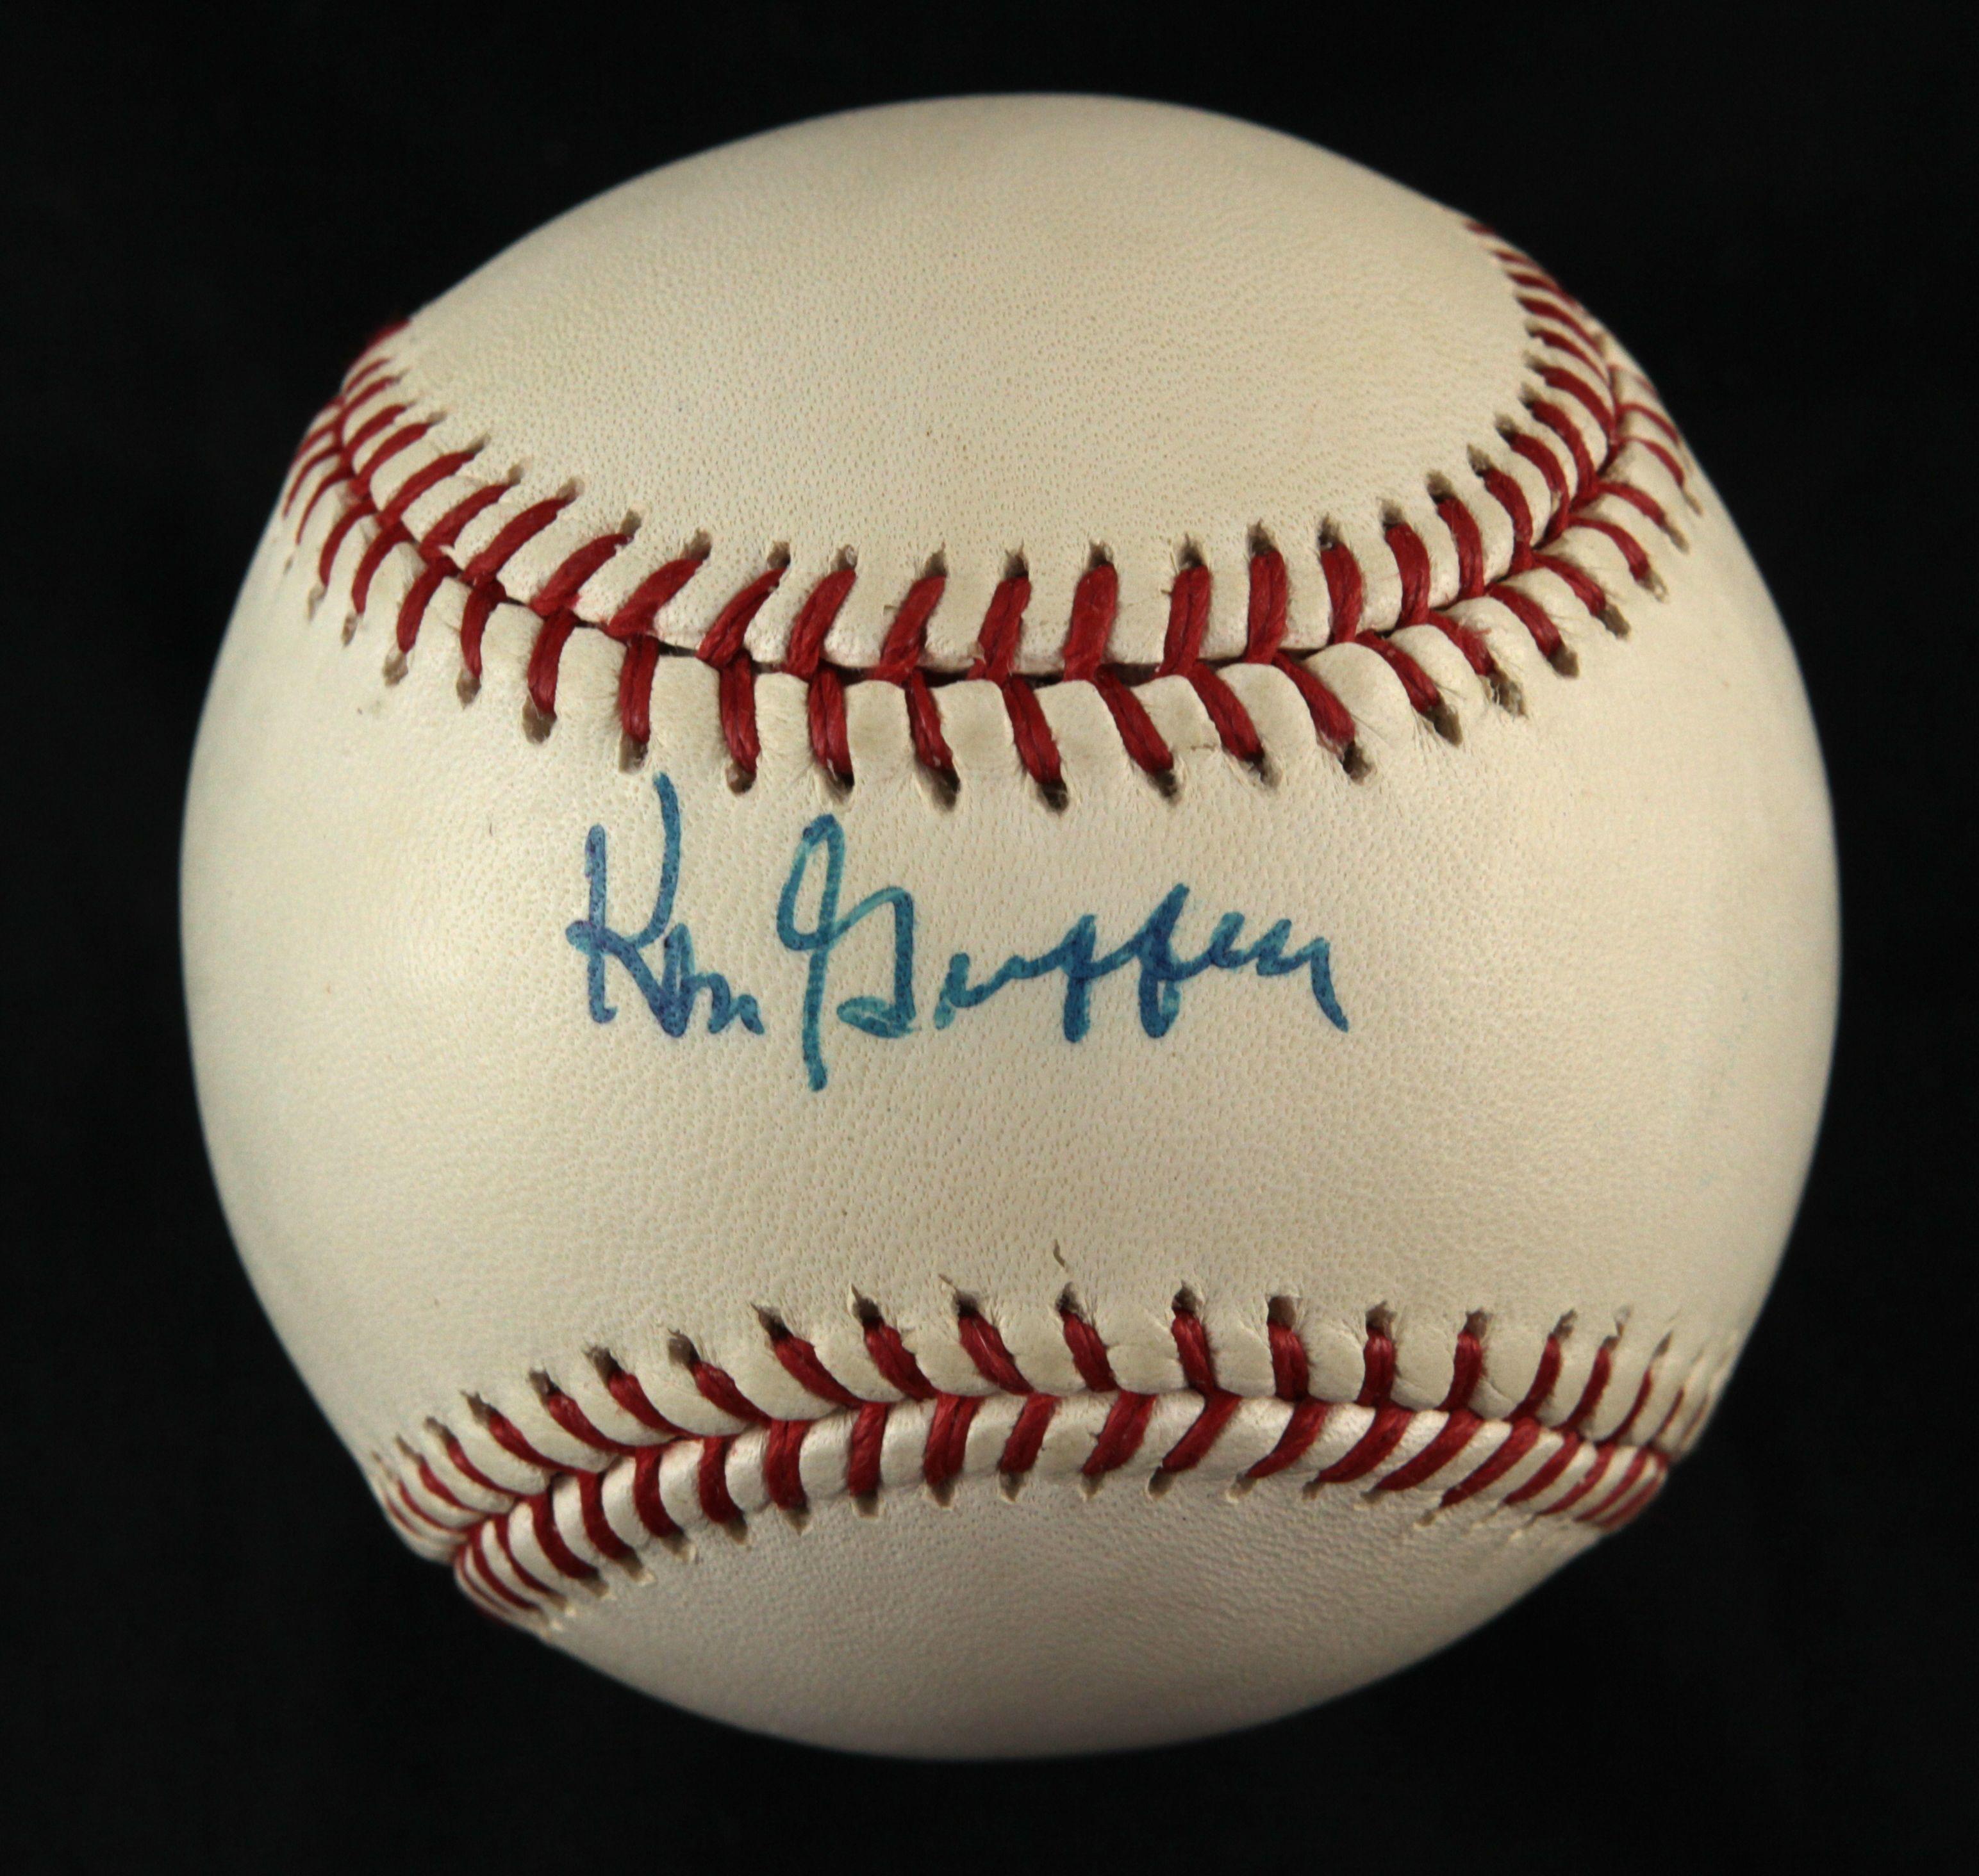 815620116b Lot Detail - 1990s Ken Griffey Sr. Seattle Mariners Signed Baseball ...